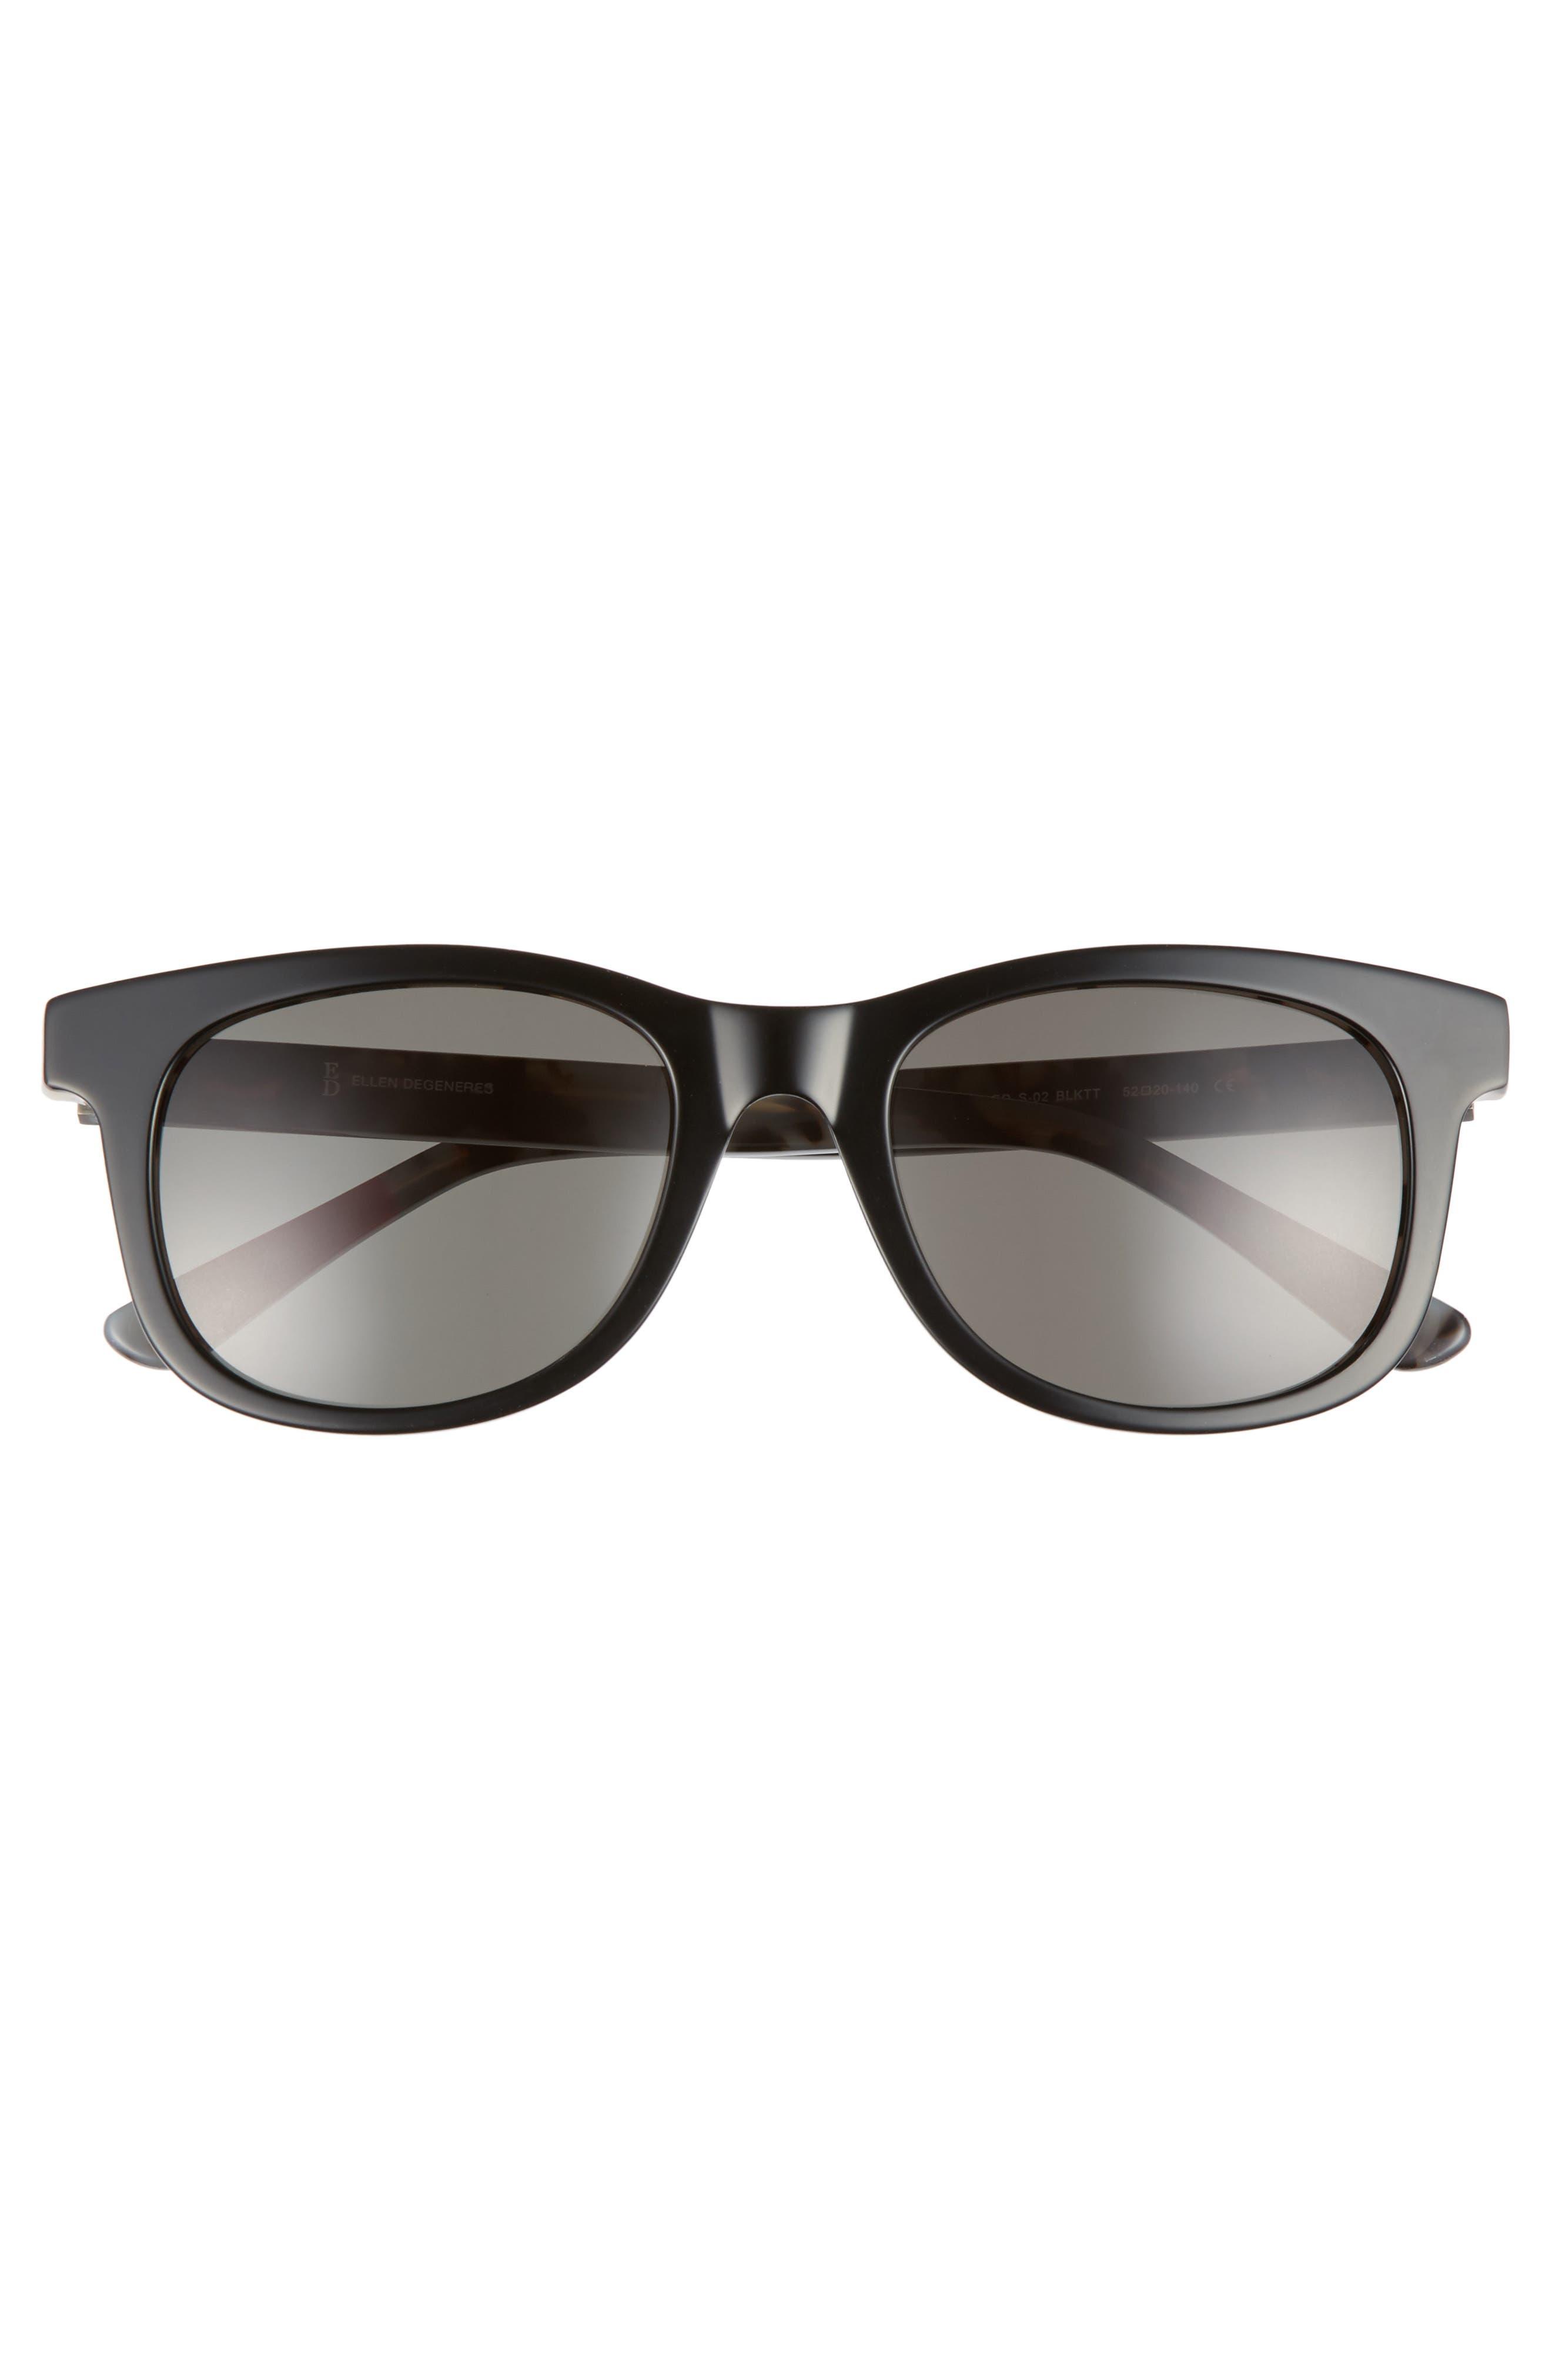 52mm Gradient Sunglasses,                             Alternate thumbnail 3, color,                             Black Tortoise